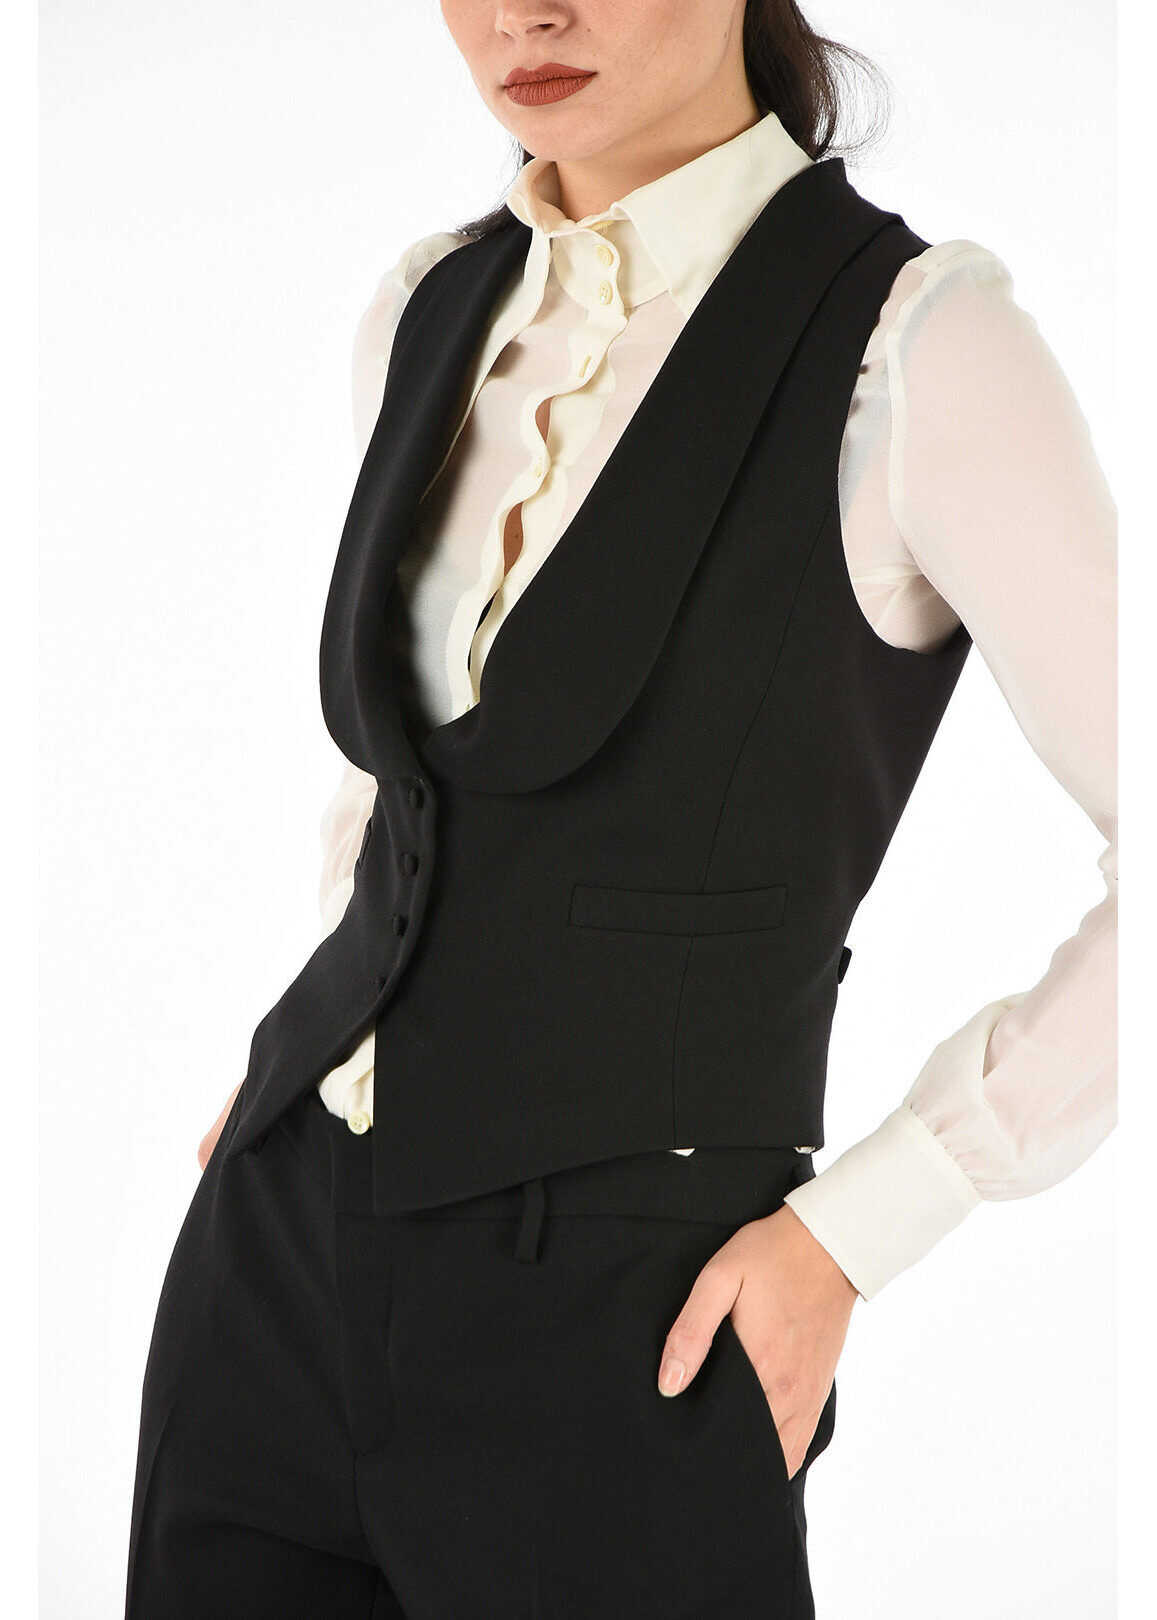 Saint Laurent virgin wool vest BLACK